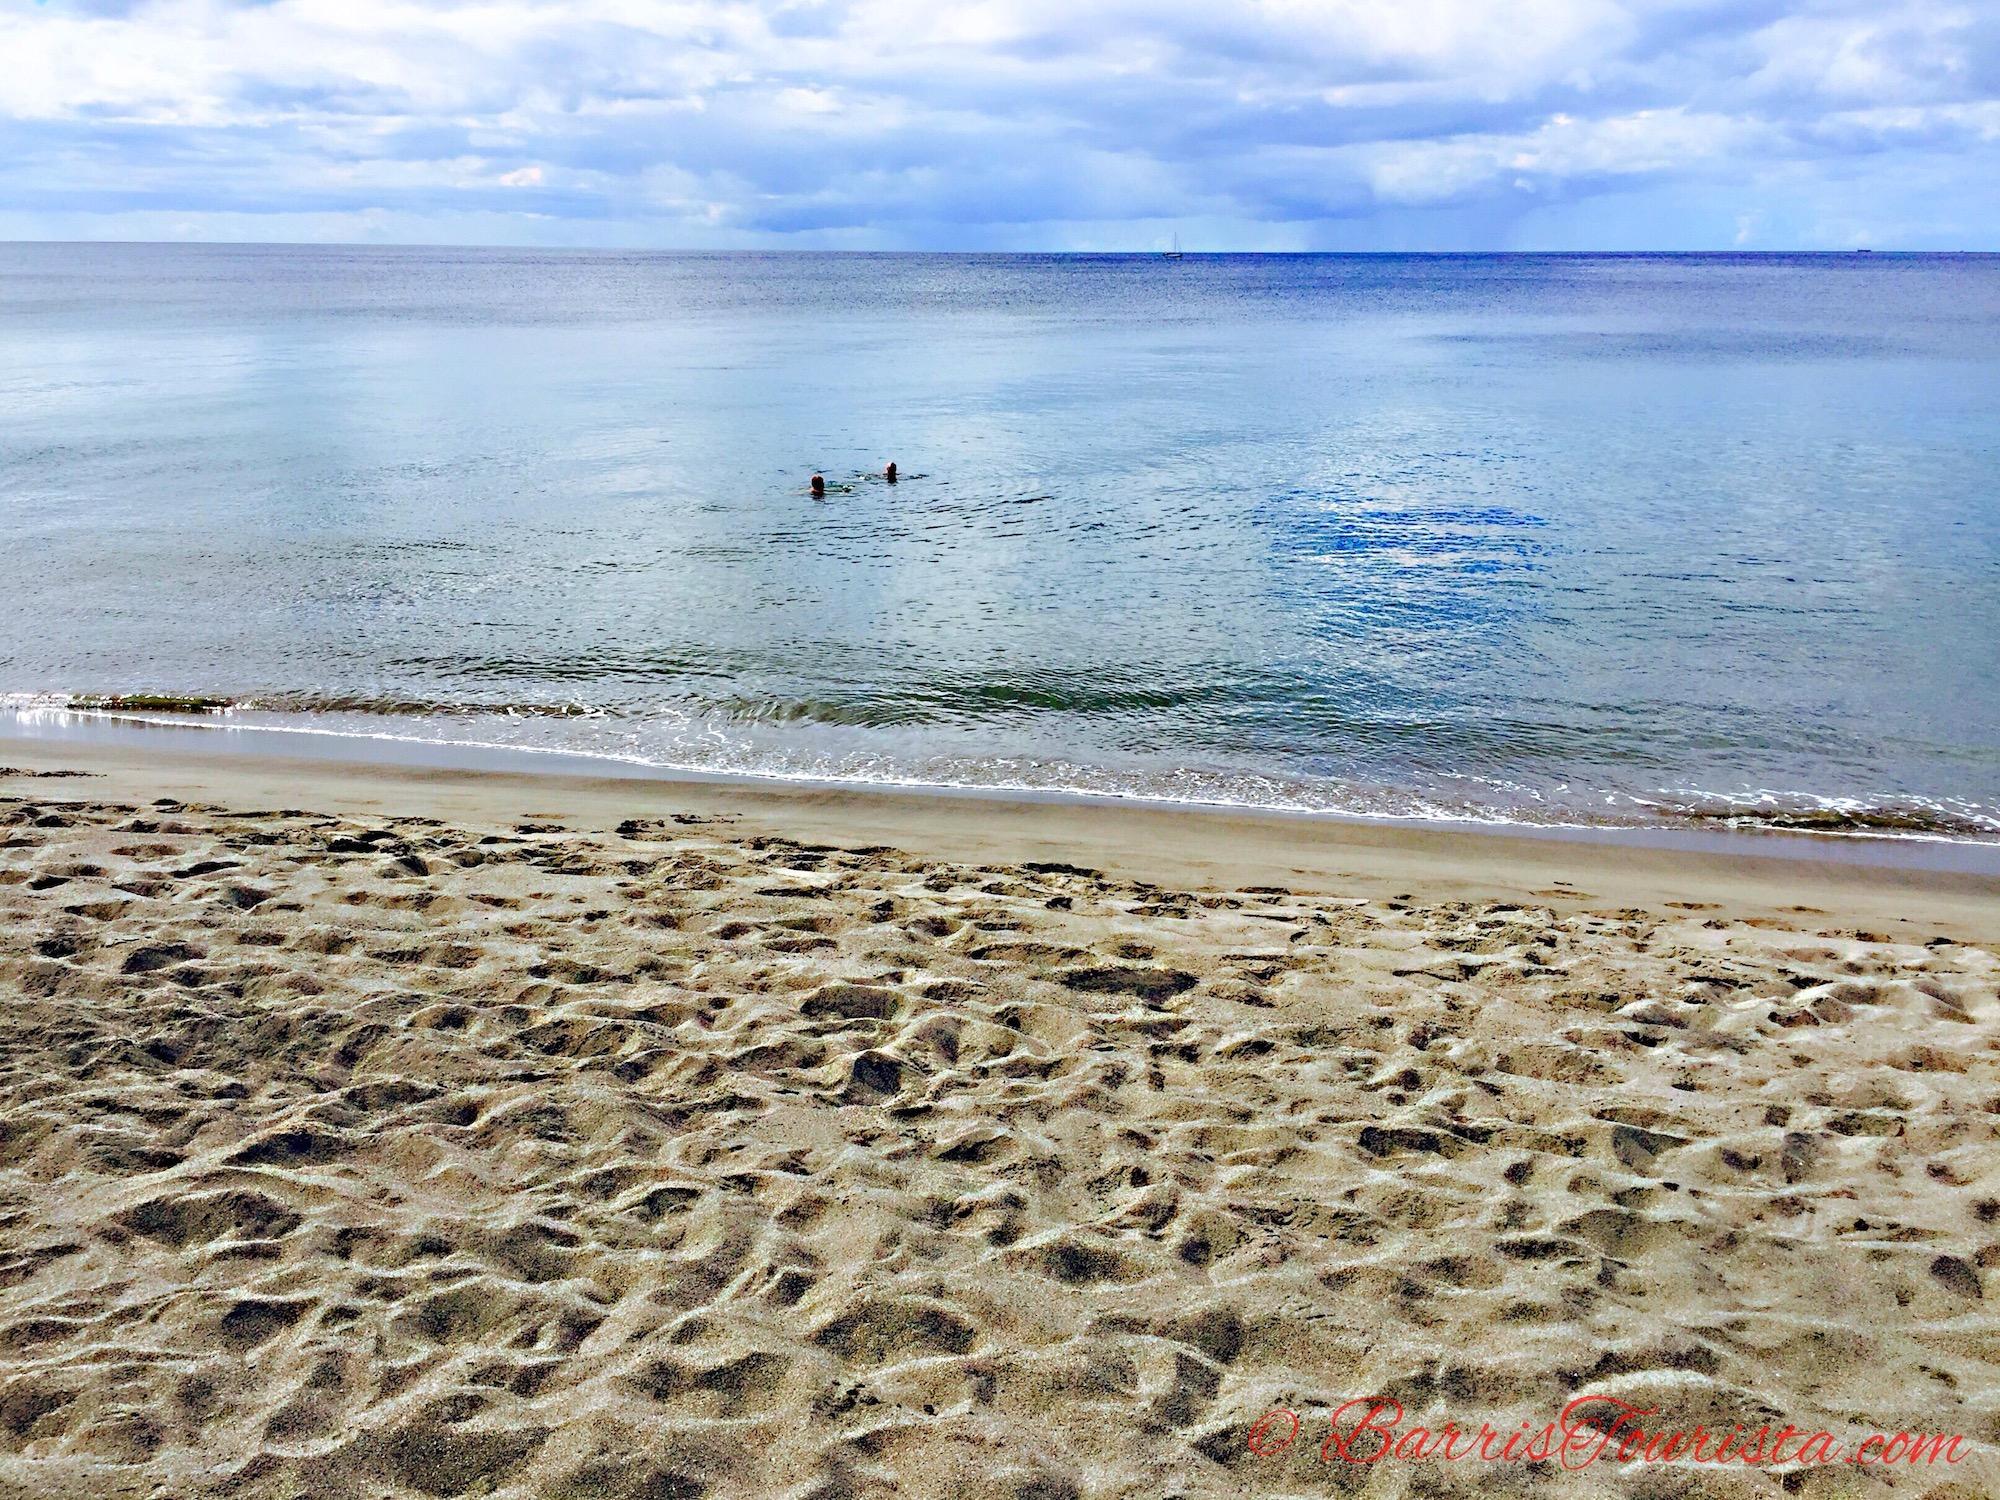 BarrisTourista-Martinique Beach karambole tours